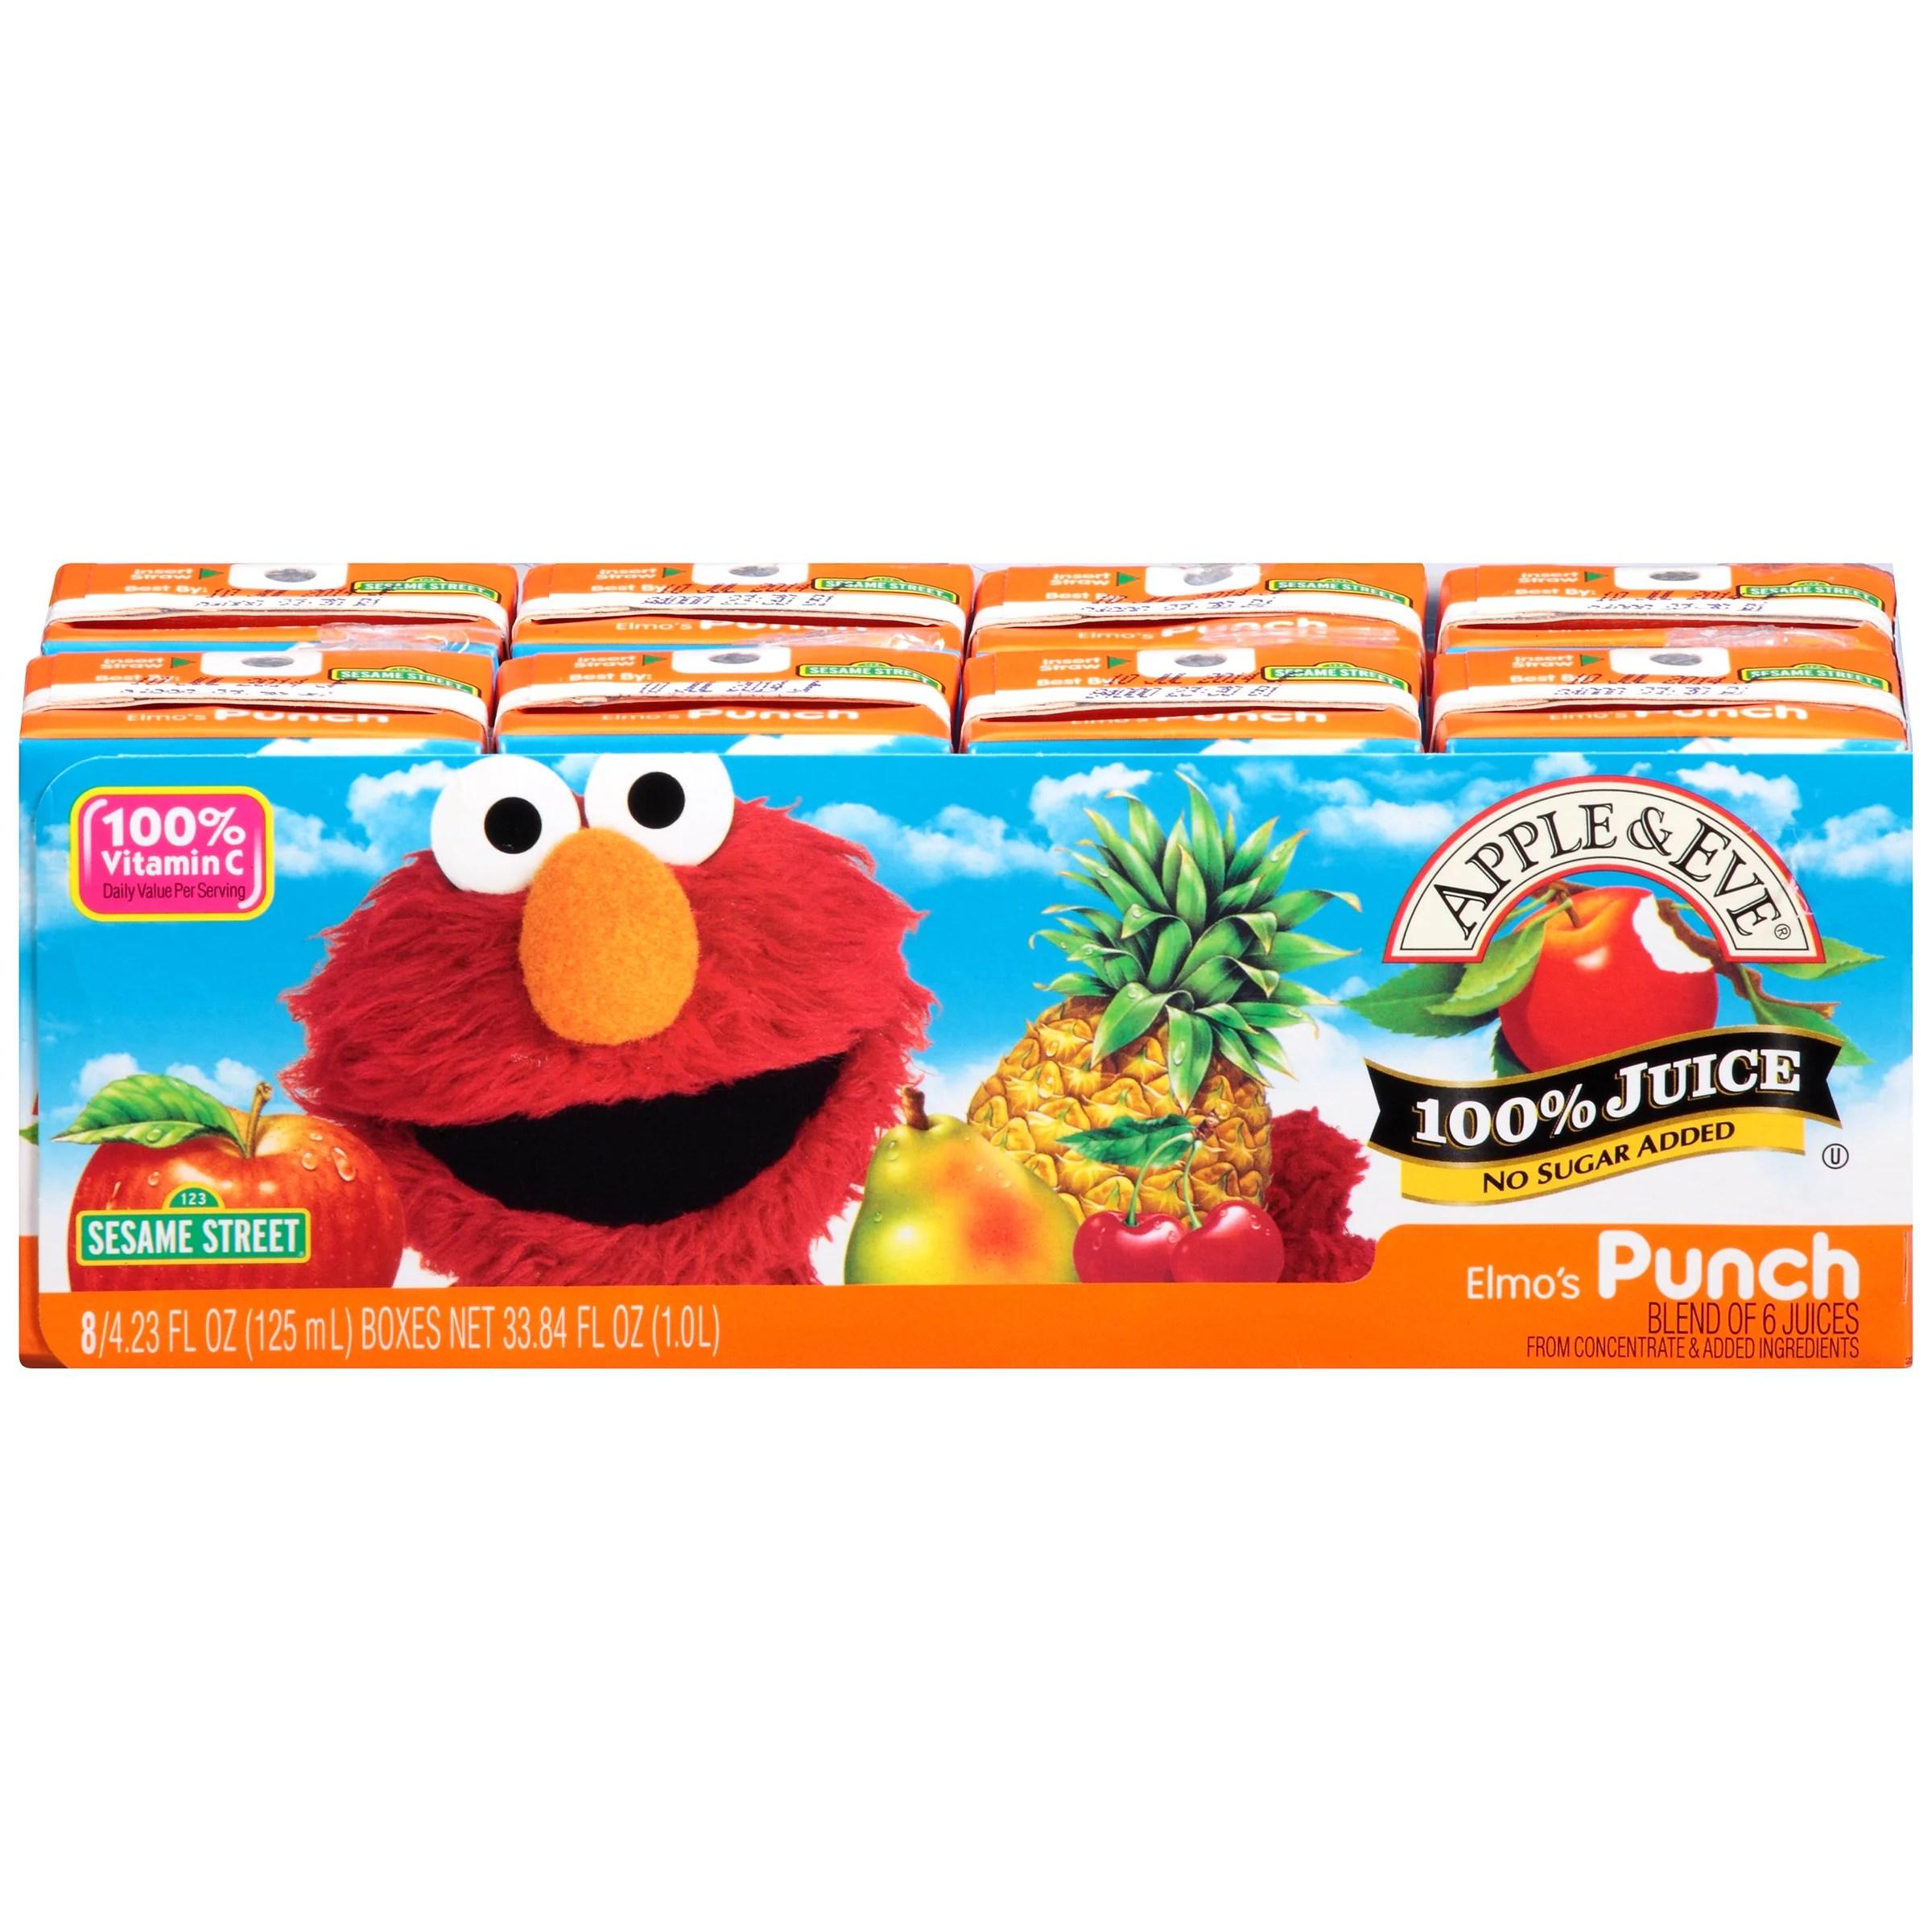 Apple Eve Sesame Street 100 Juice Elmo39s Punch 423